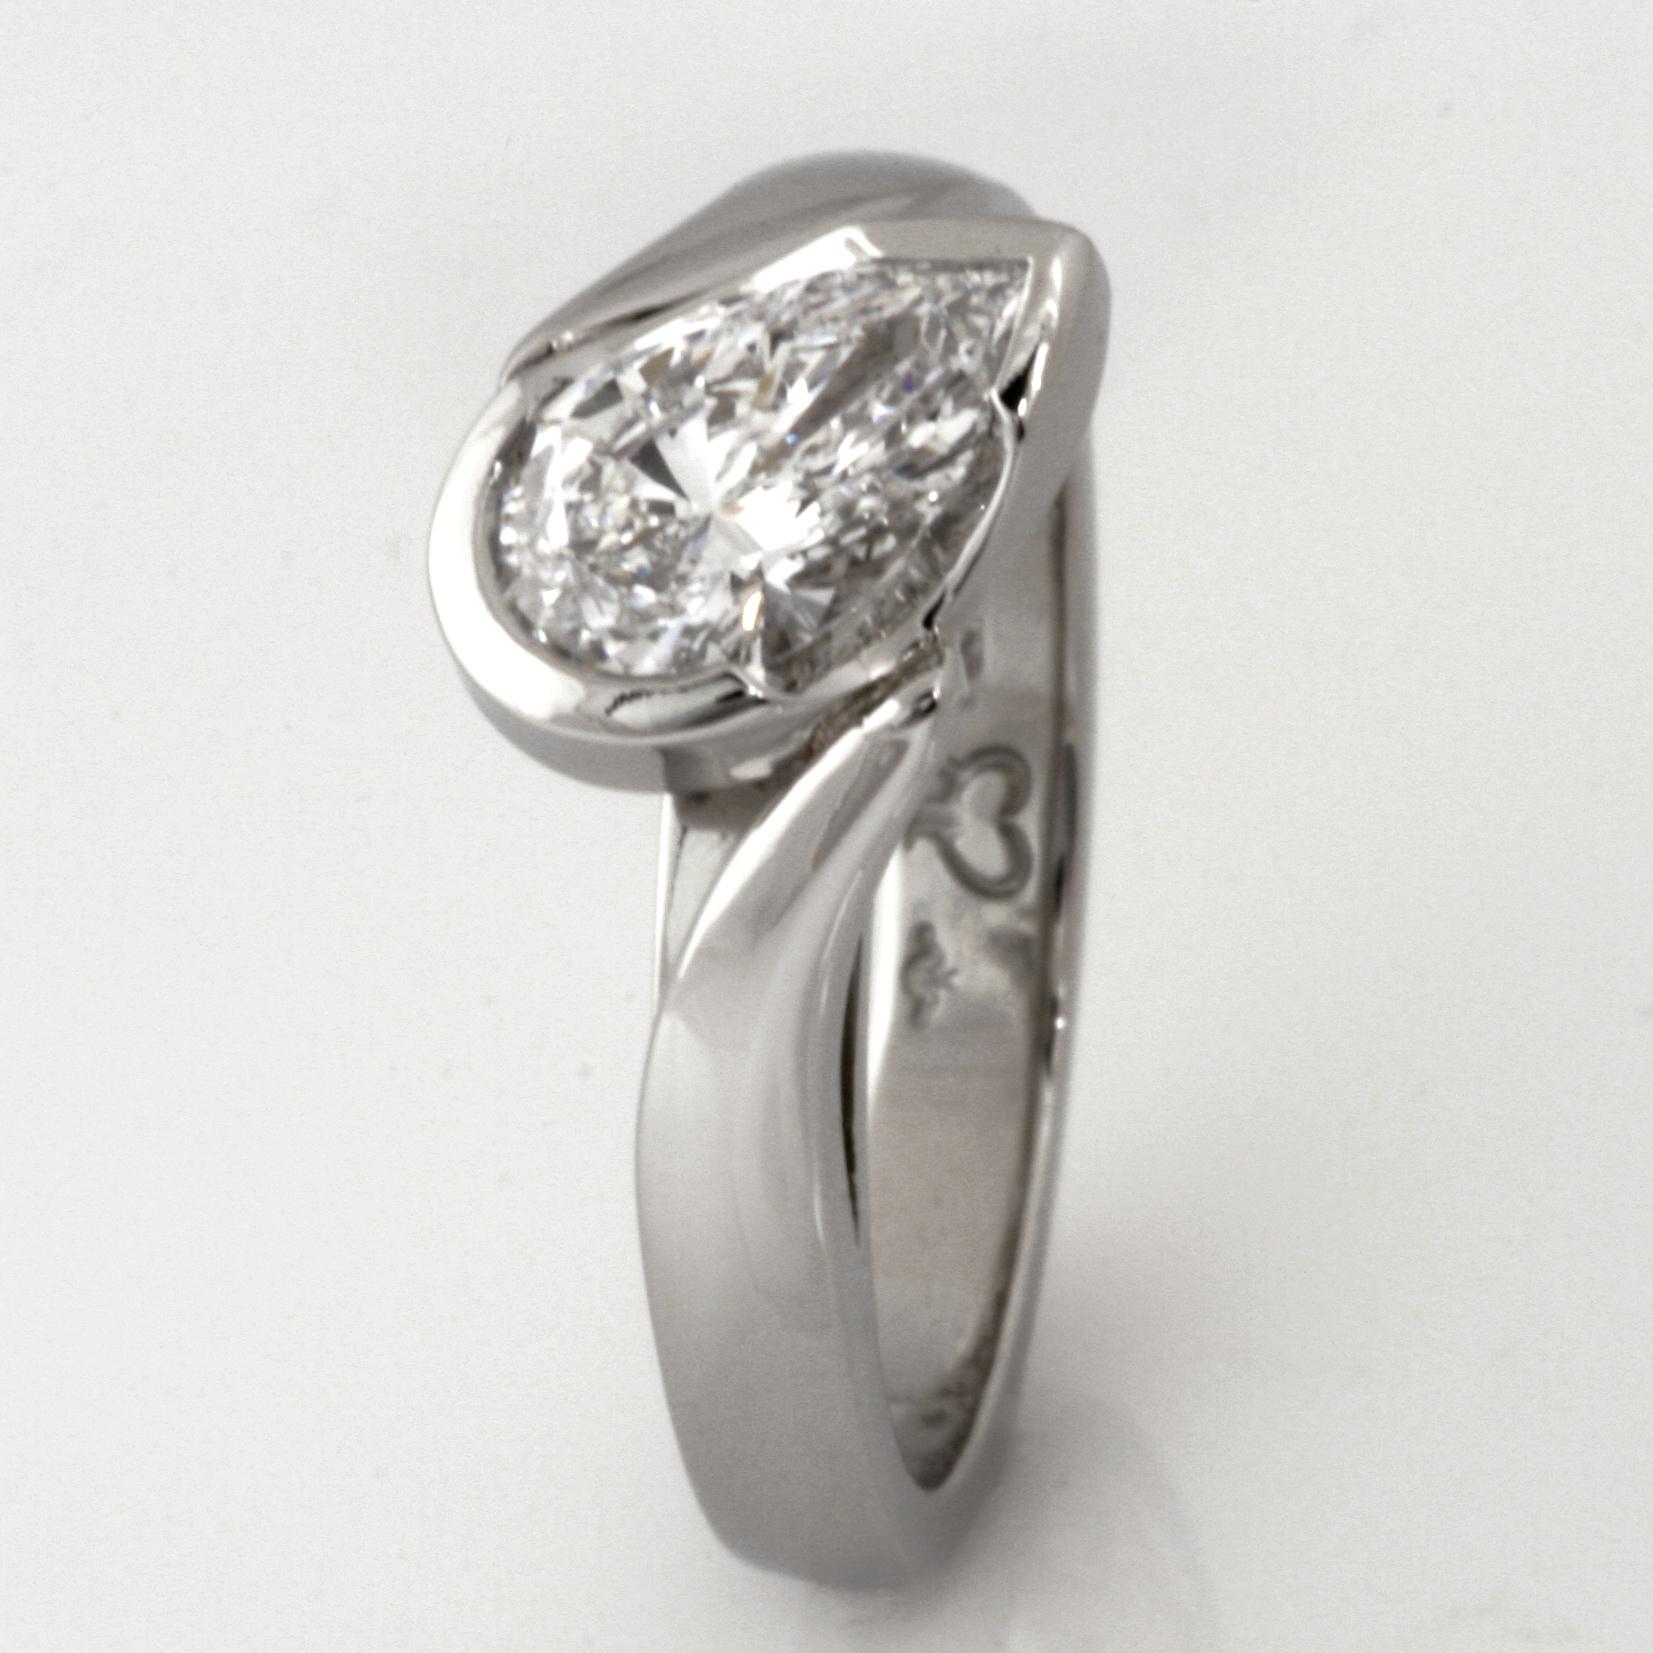 Handamde ladies platinum engagement ring featuring a pear shaped diamond